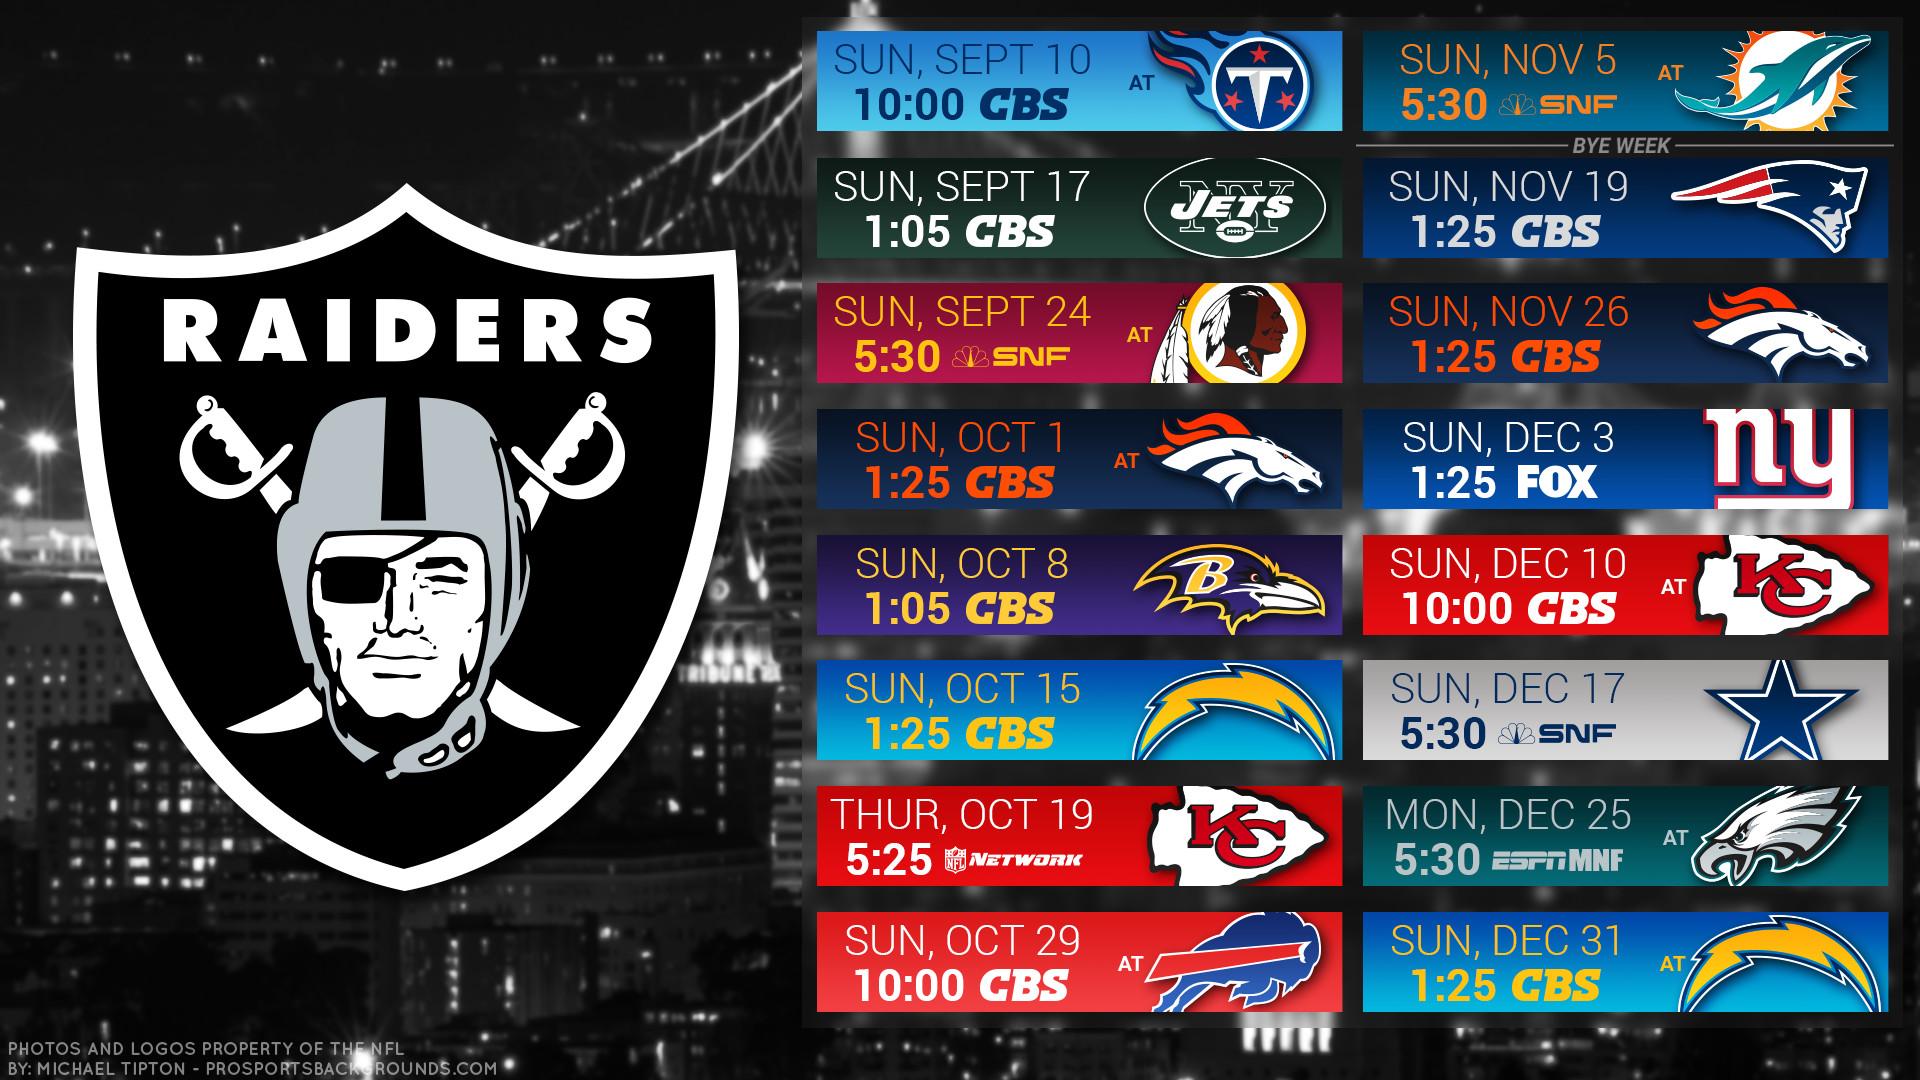 Oakland Raiders 2017 schedule city football logo wallpaper free pc desktop  computer …